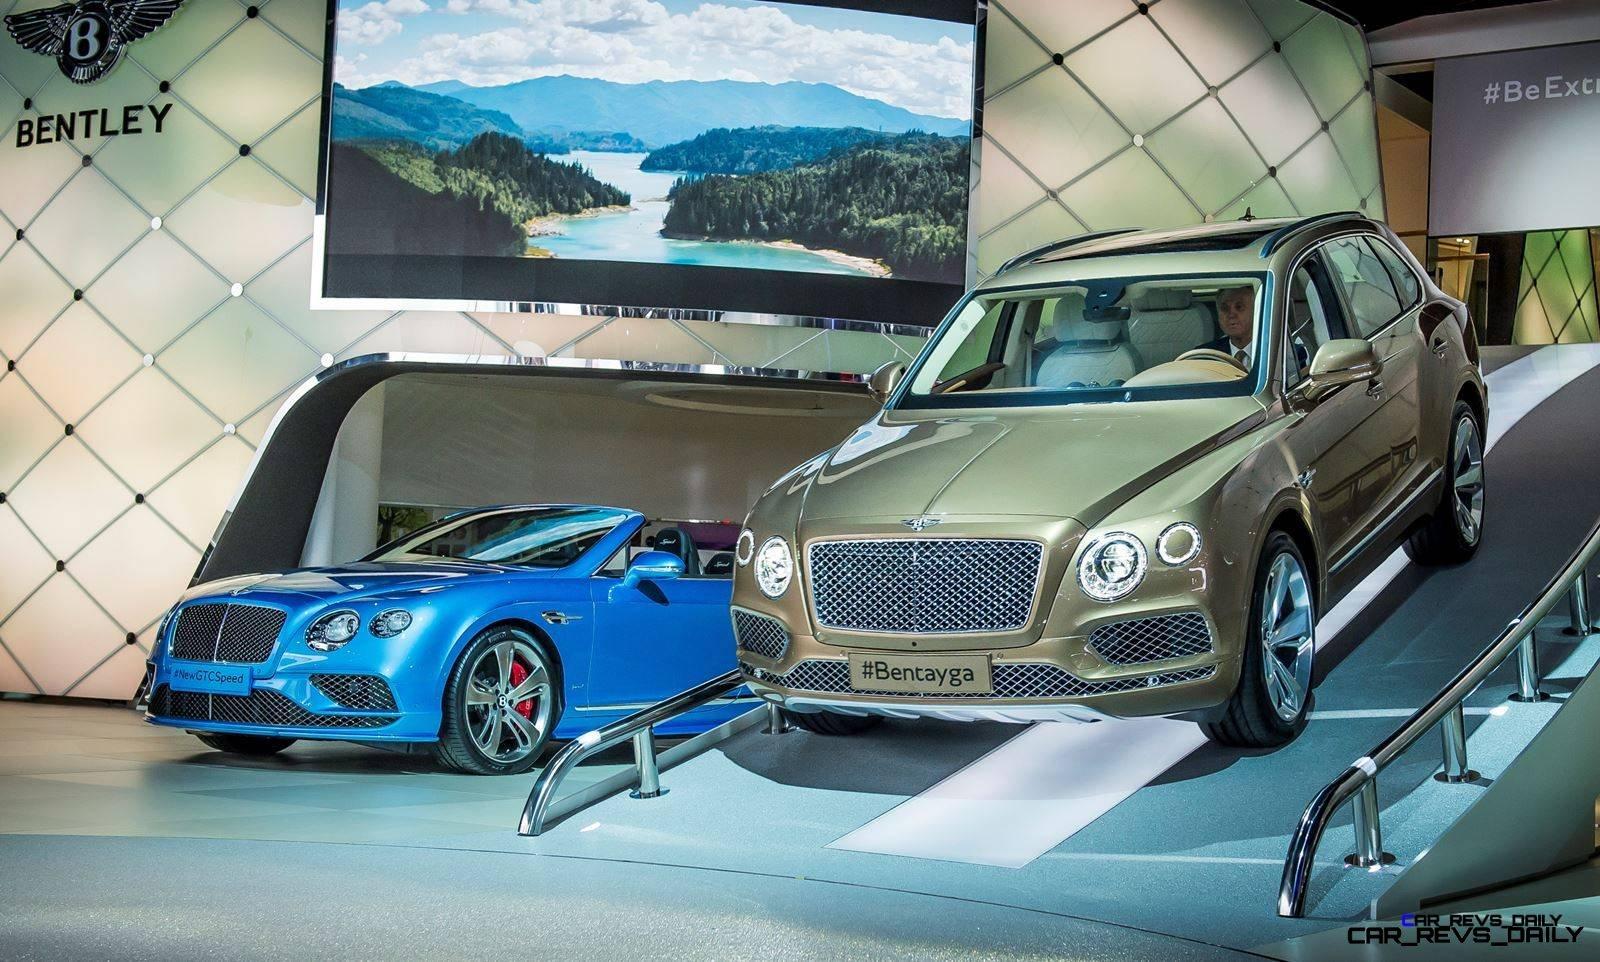 Bentley at Frankfurt motor showPhoto: James Lipman